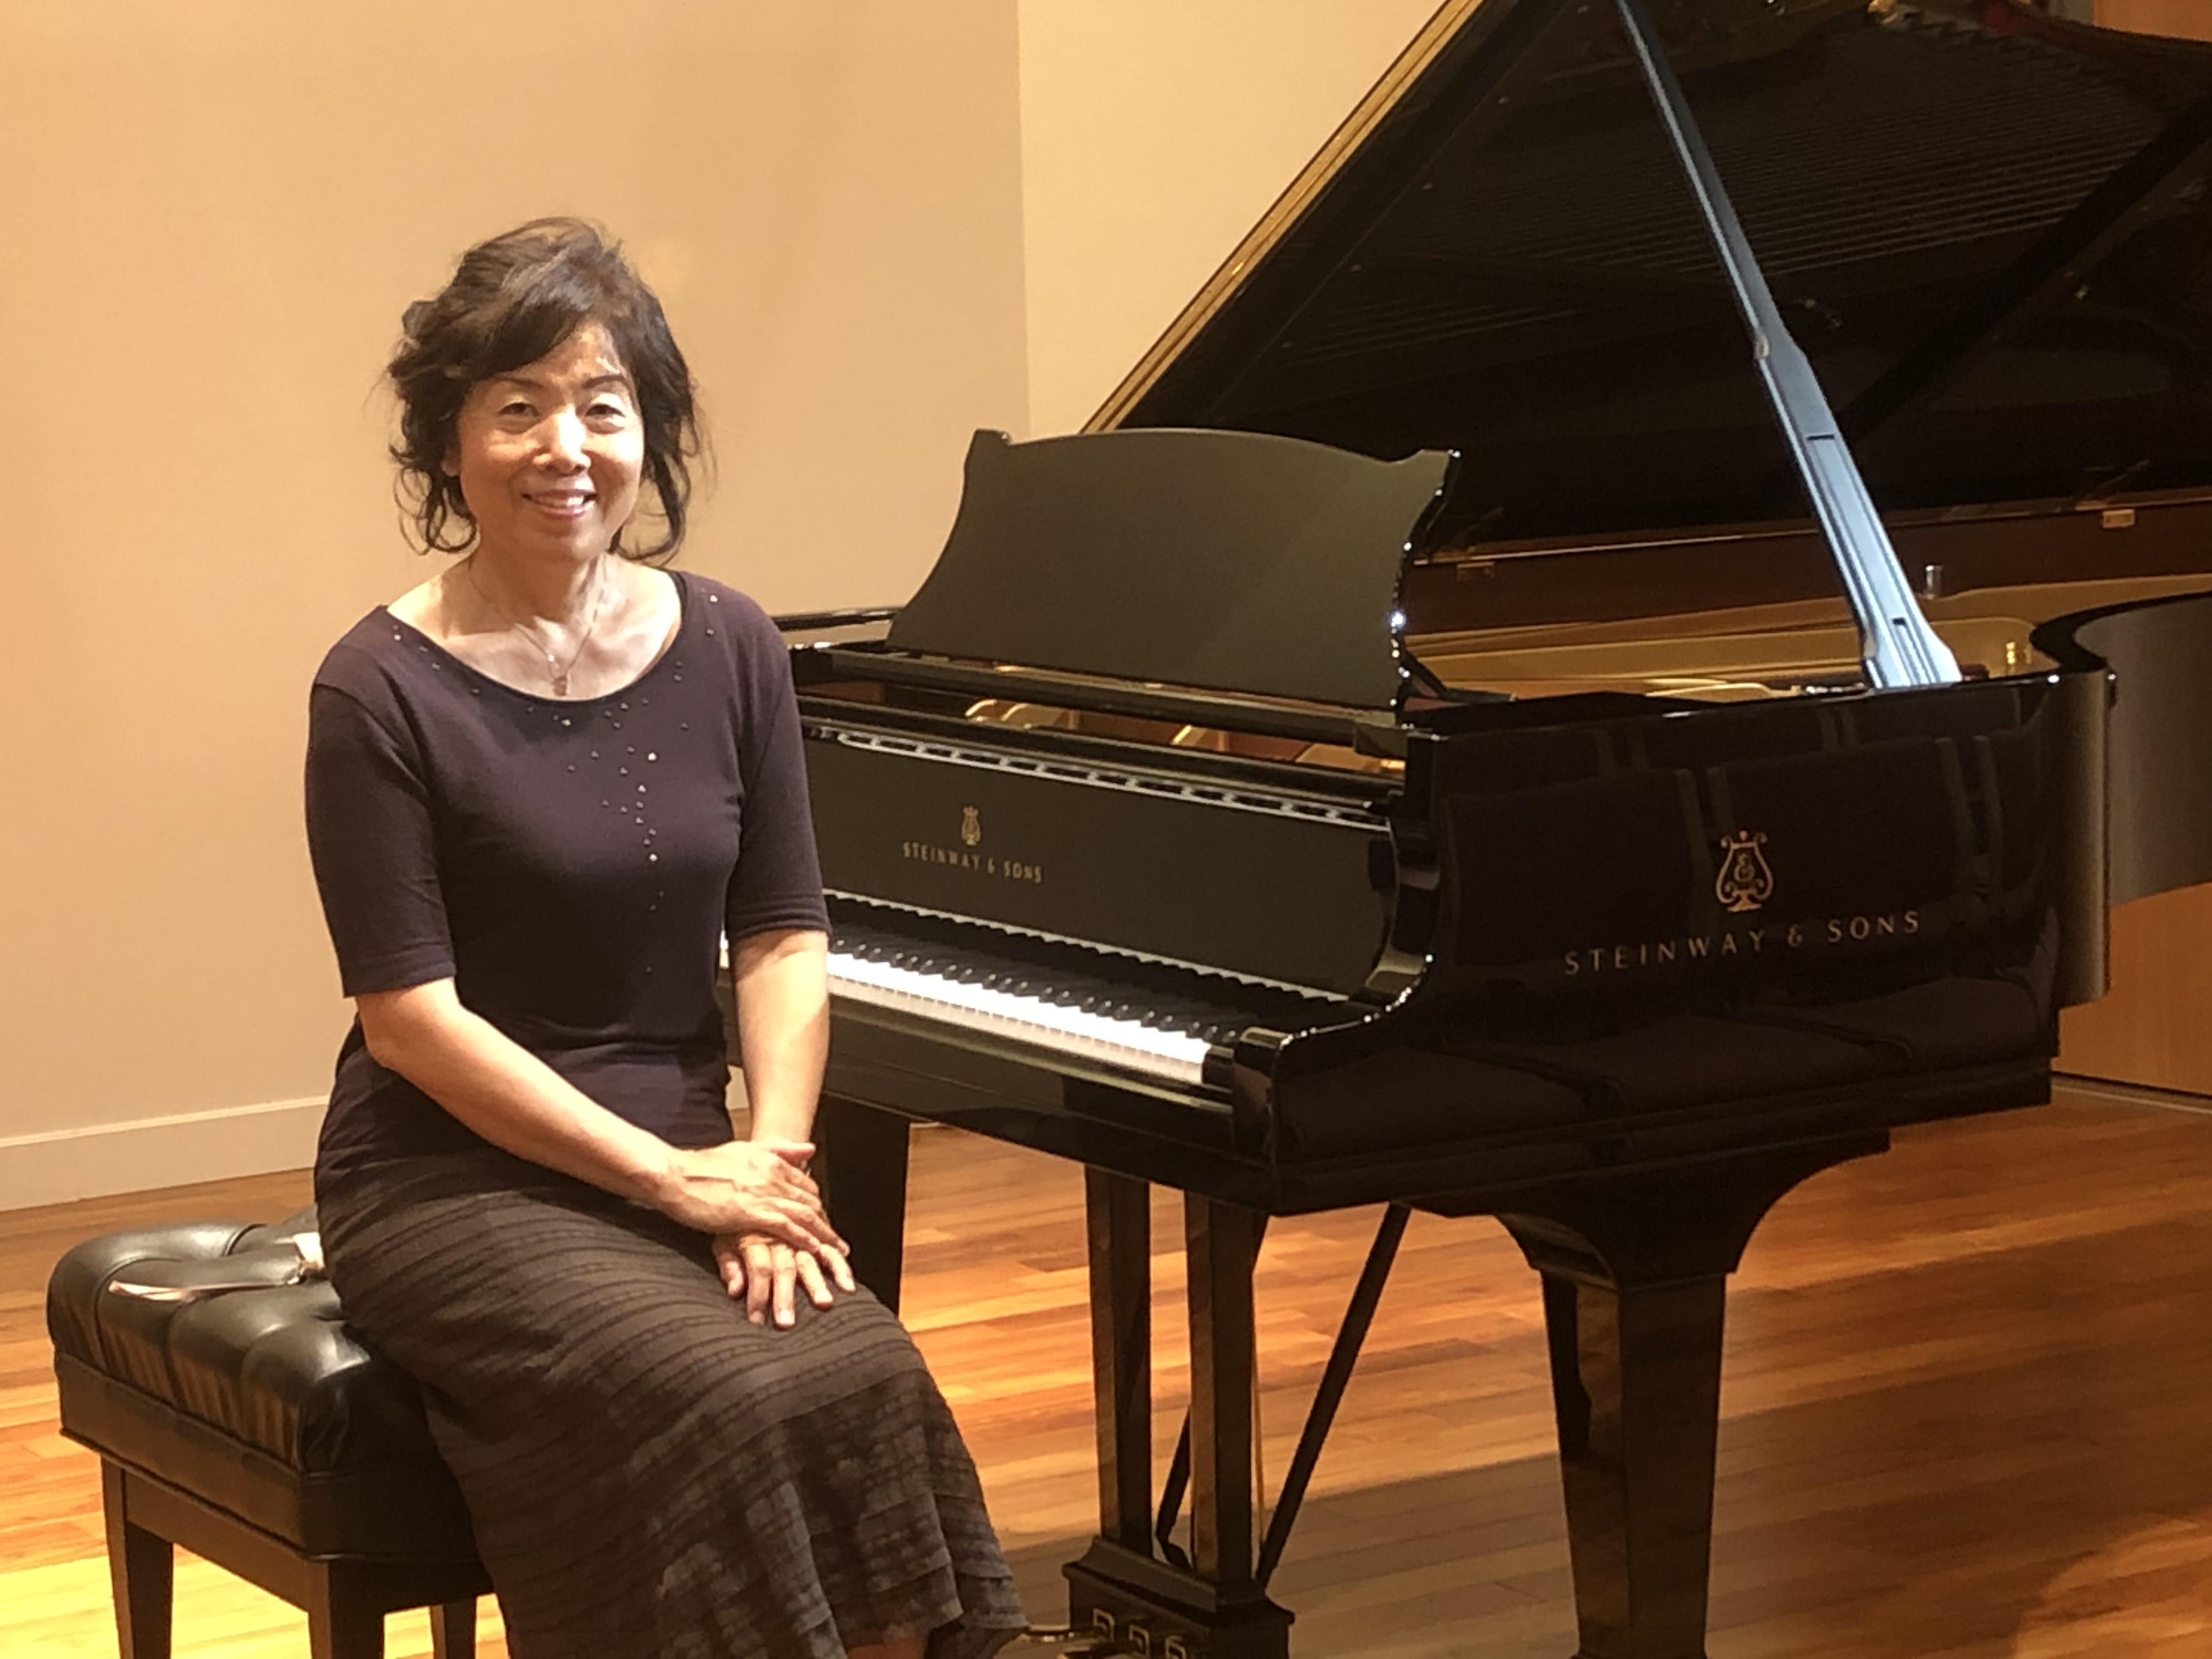 Steinway Artist 前田美由紀先生による「Steinway Piano Lesson vol.4」当日の様子